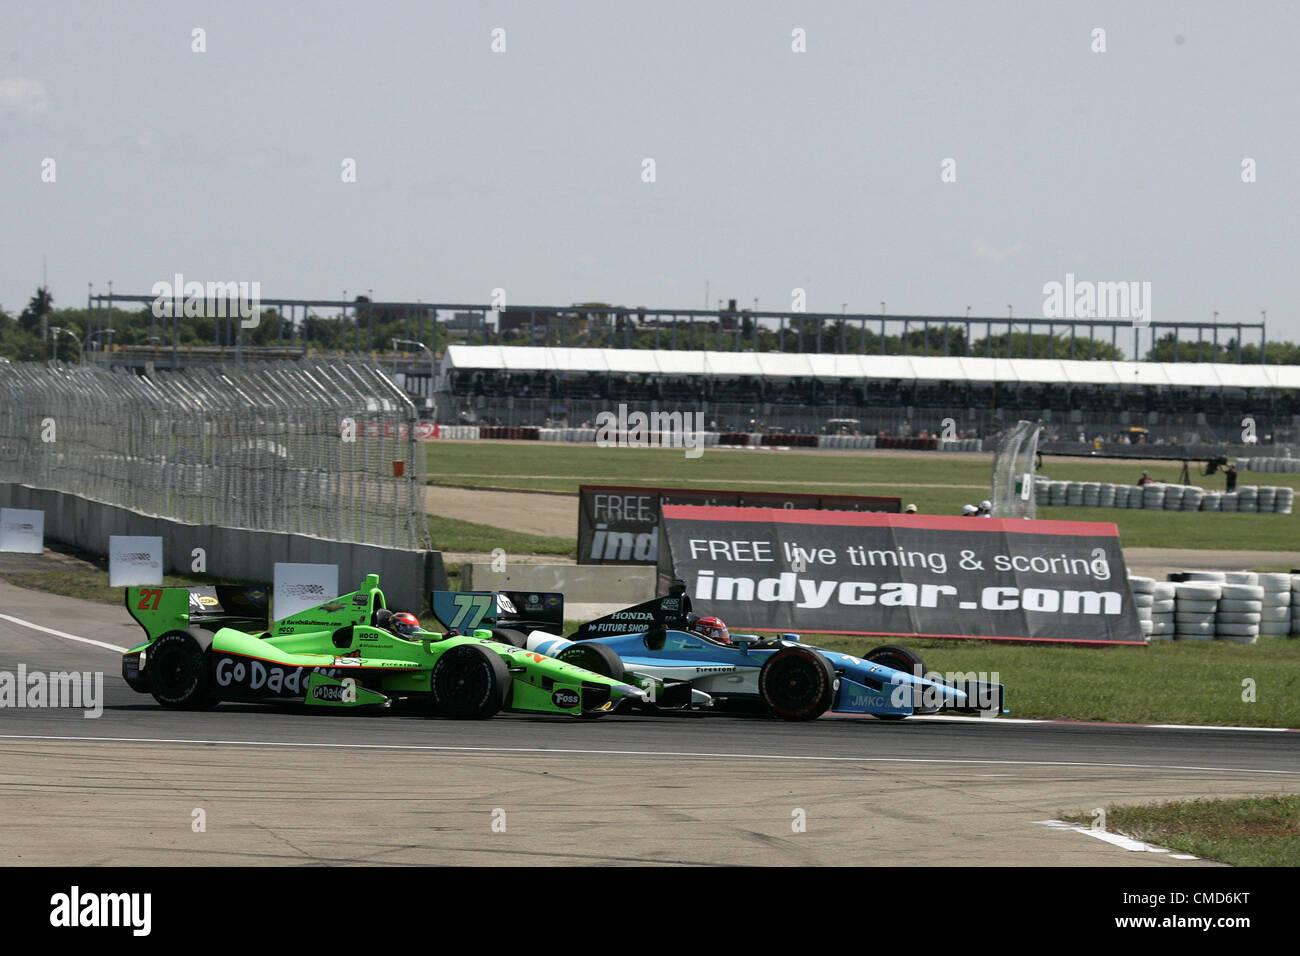 simon motorsport shop